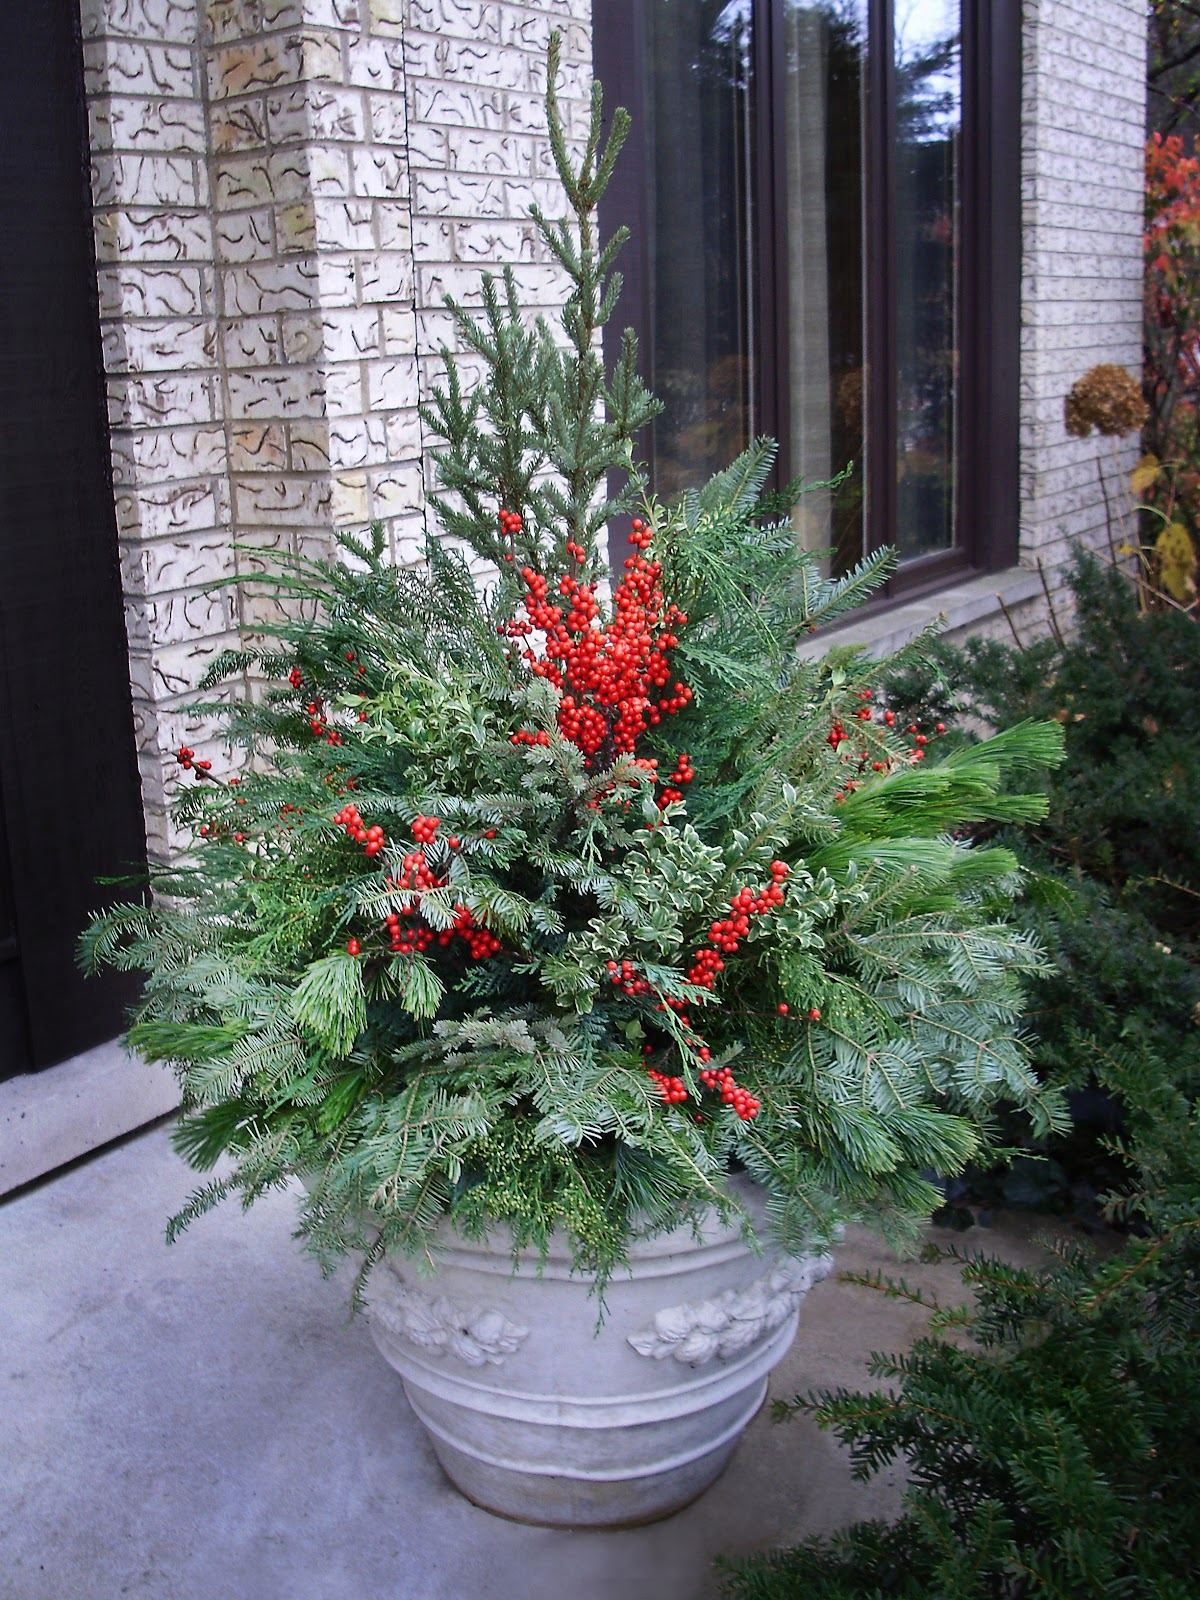 December 2012 The Hortiholic